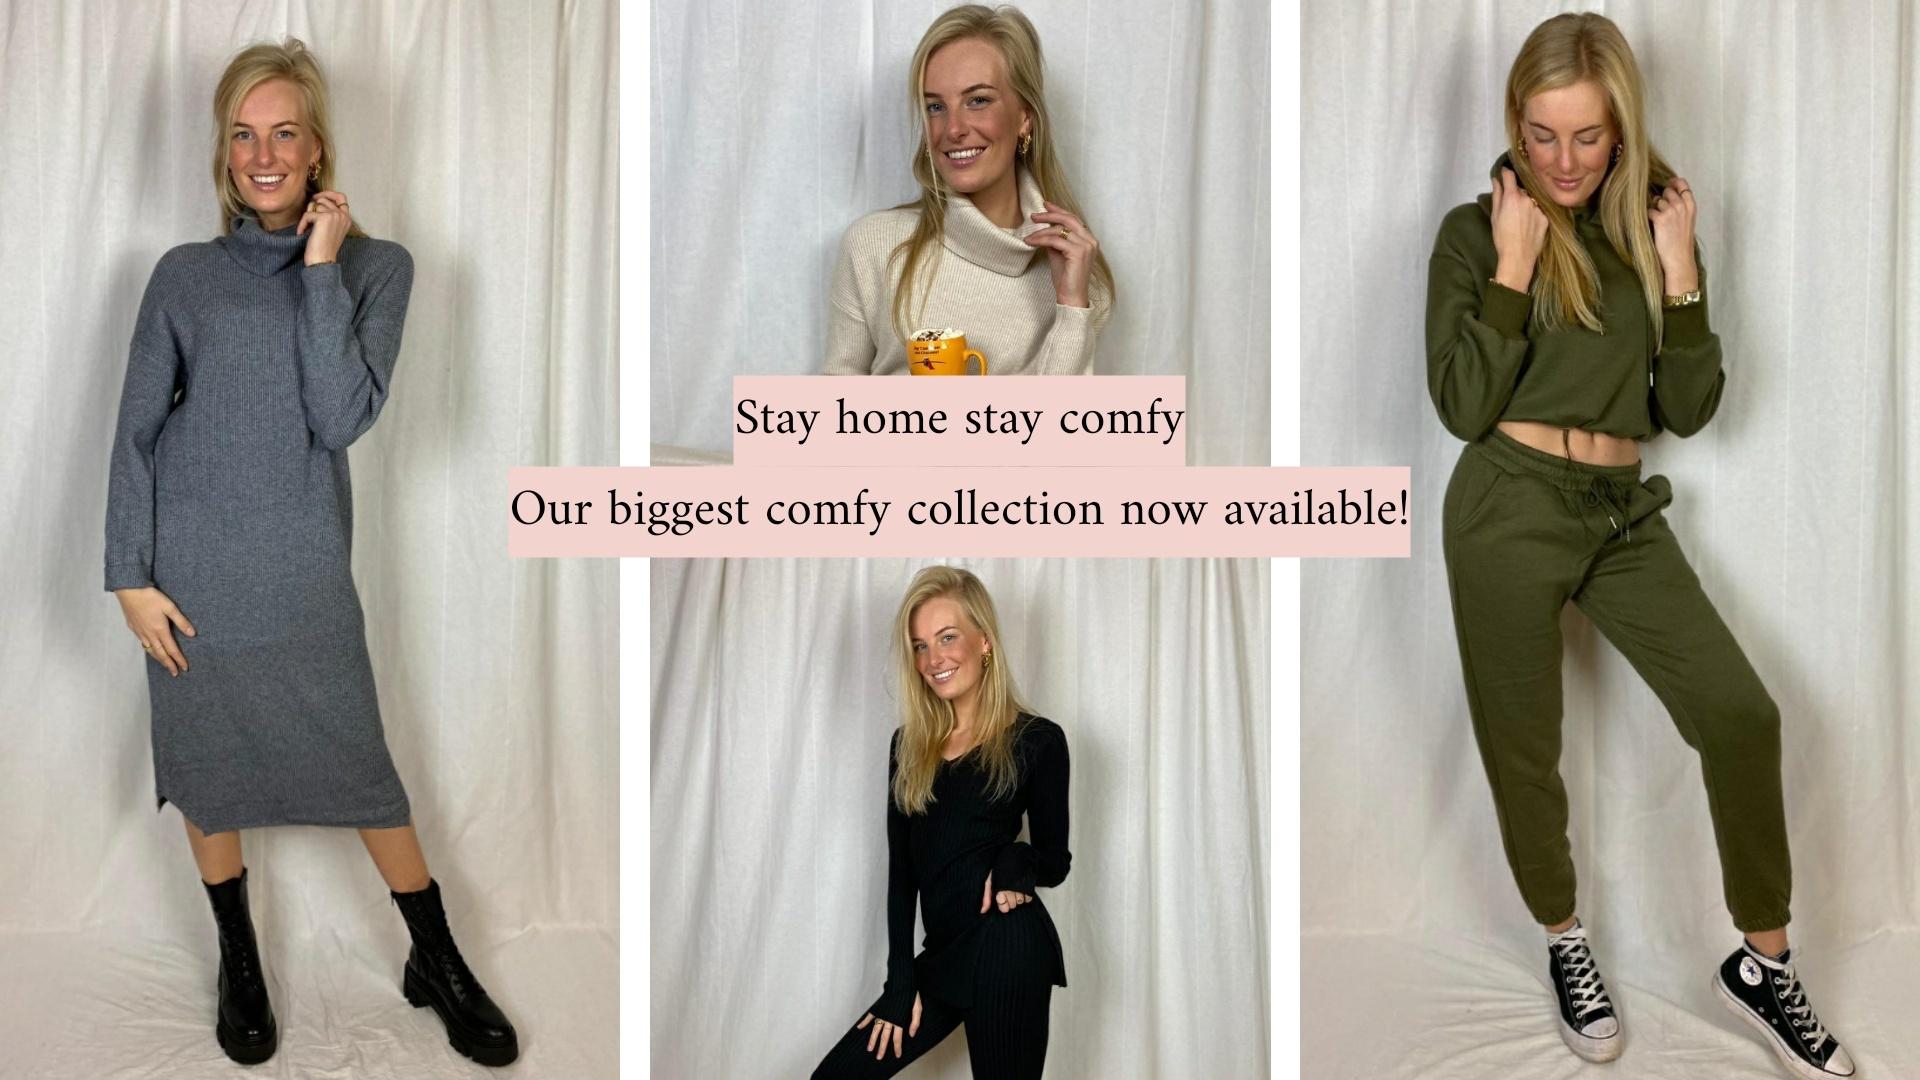 Comfortabele outfitjes ideaal voor deze tijd. Fashionable at home!